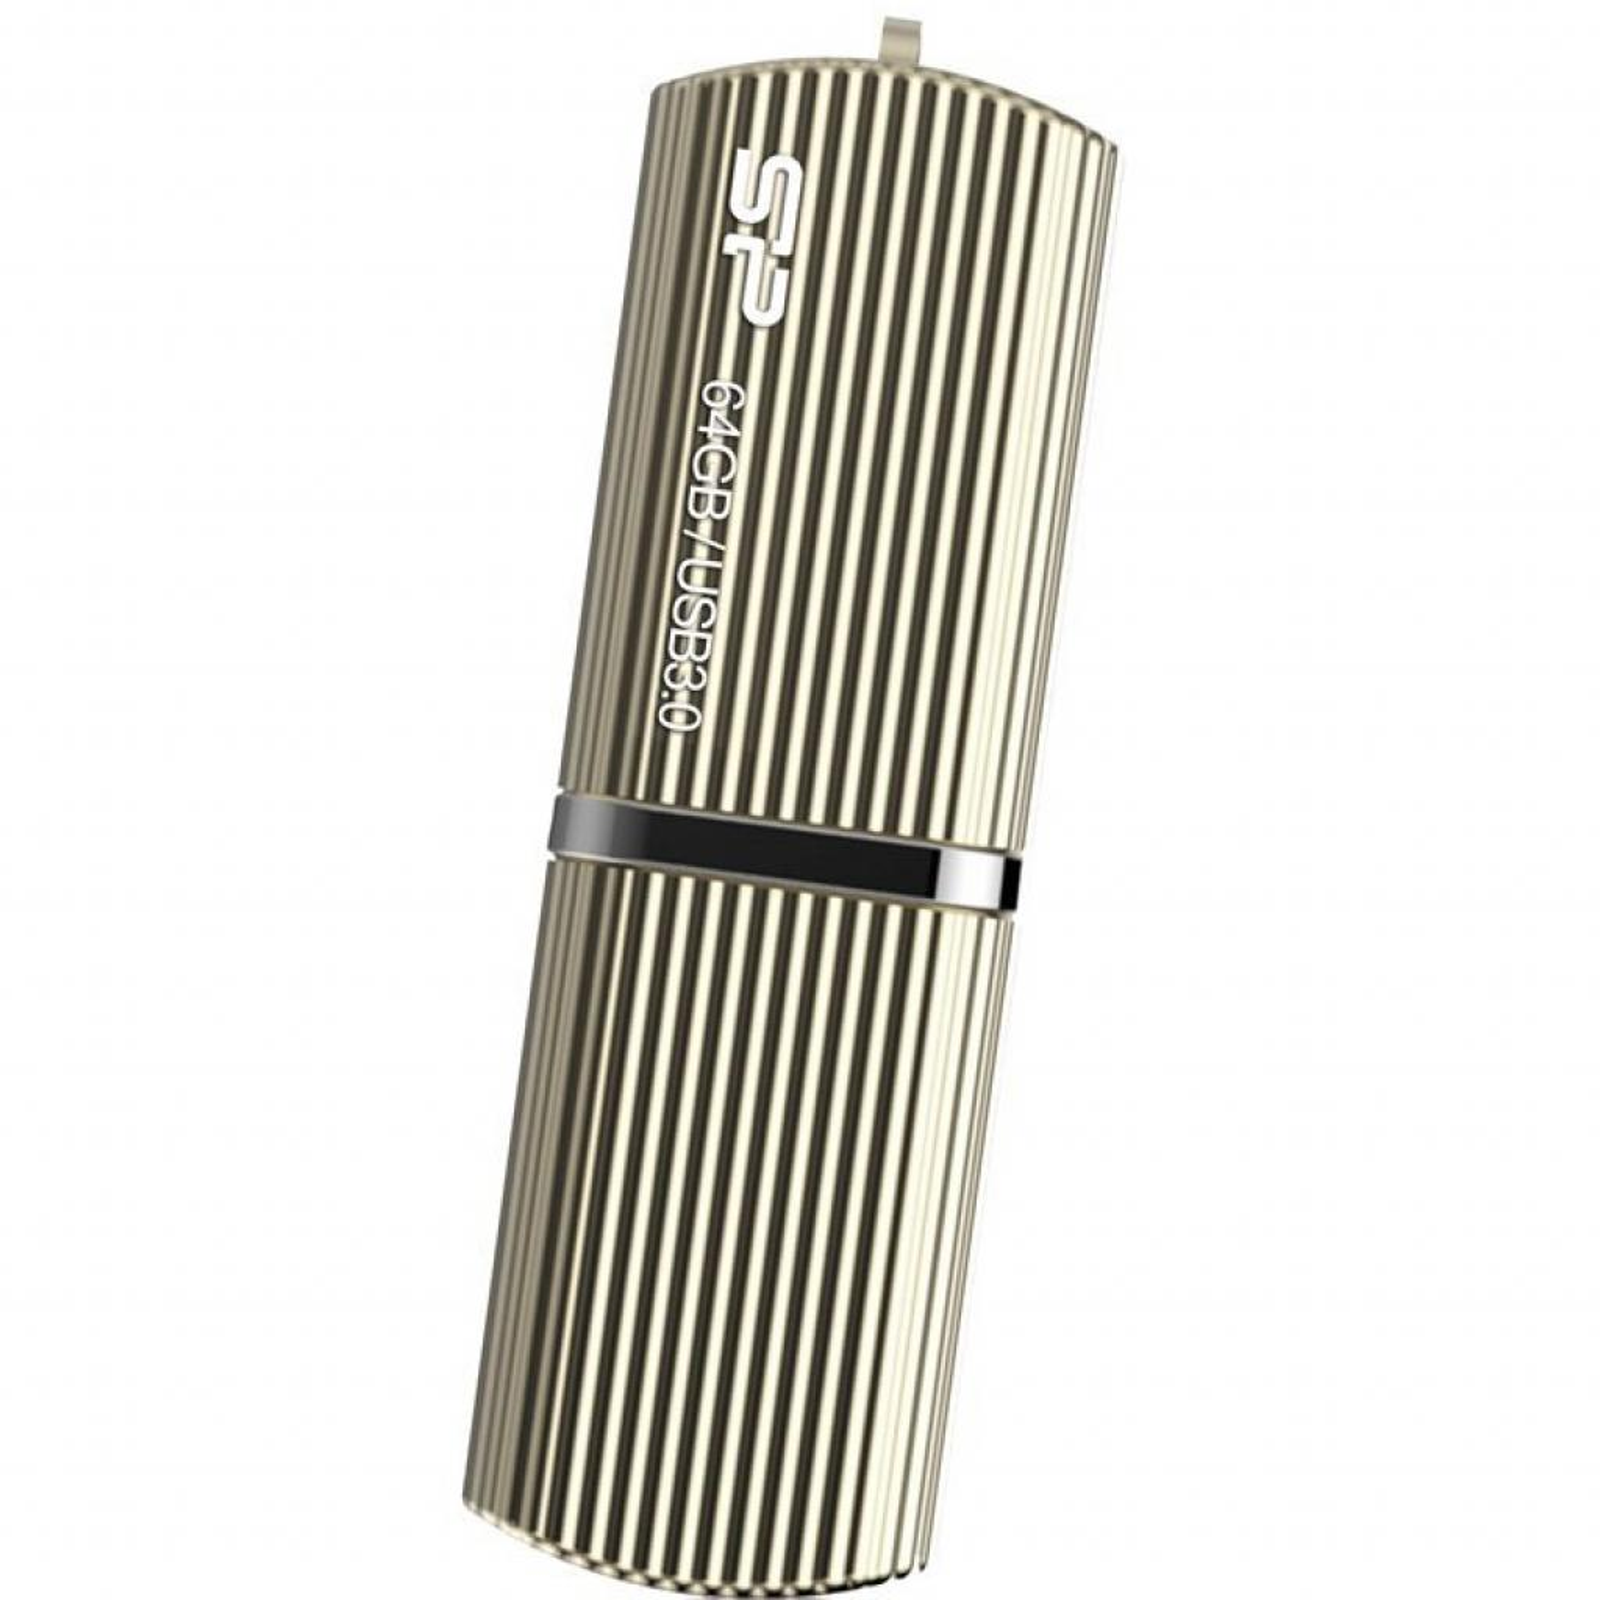 USB флеш накопитель Silicon Power 64GB MARVEL M50 Champagne USB 3.0 (SP064GBUF3M50V1С) изображение 2